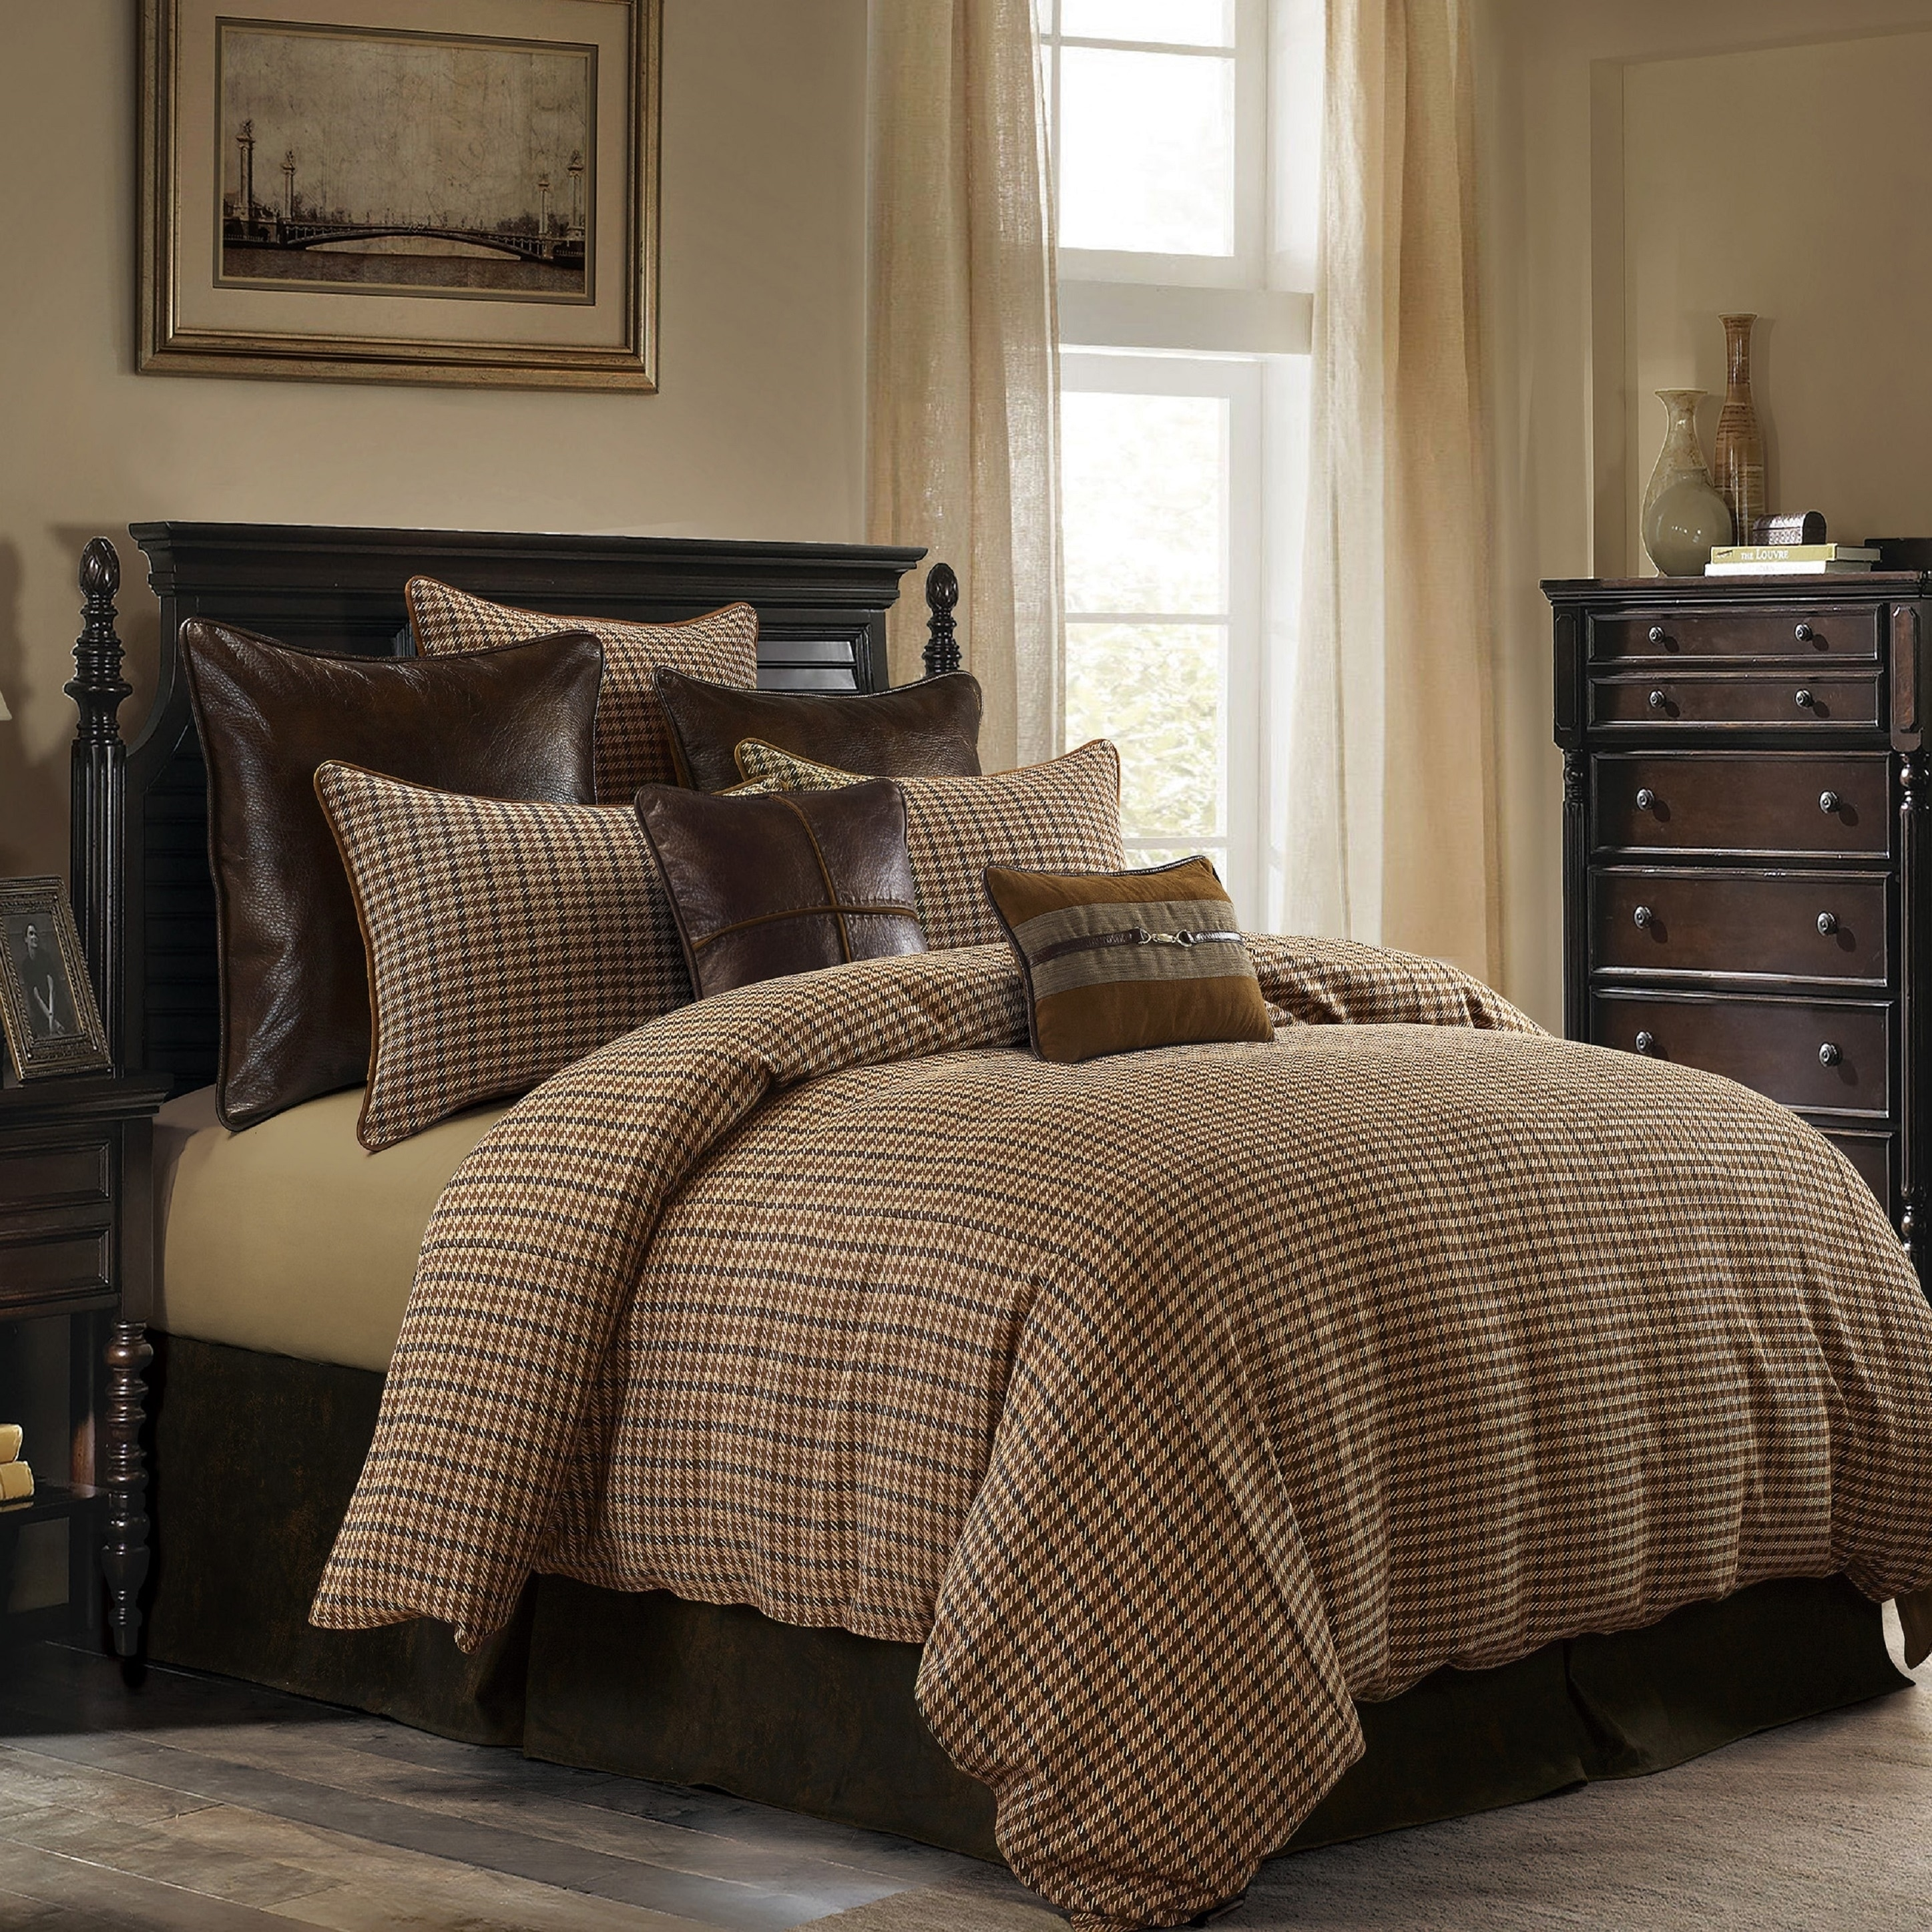 Shop Black Friday Deals On Hiend Accents Clifton Comforter Set Super Queen Overstock 28654991